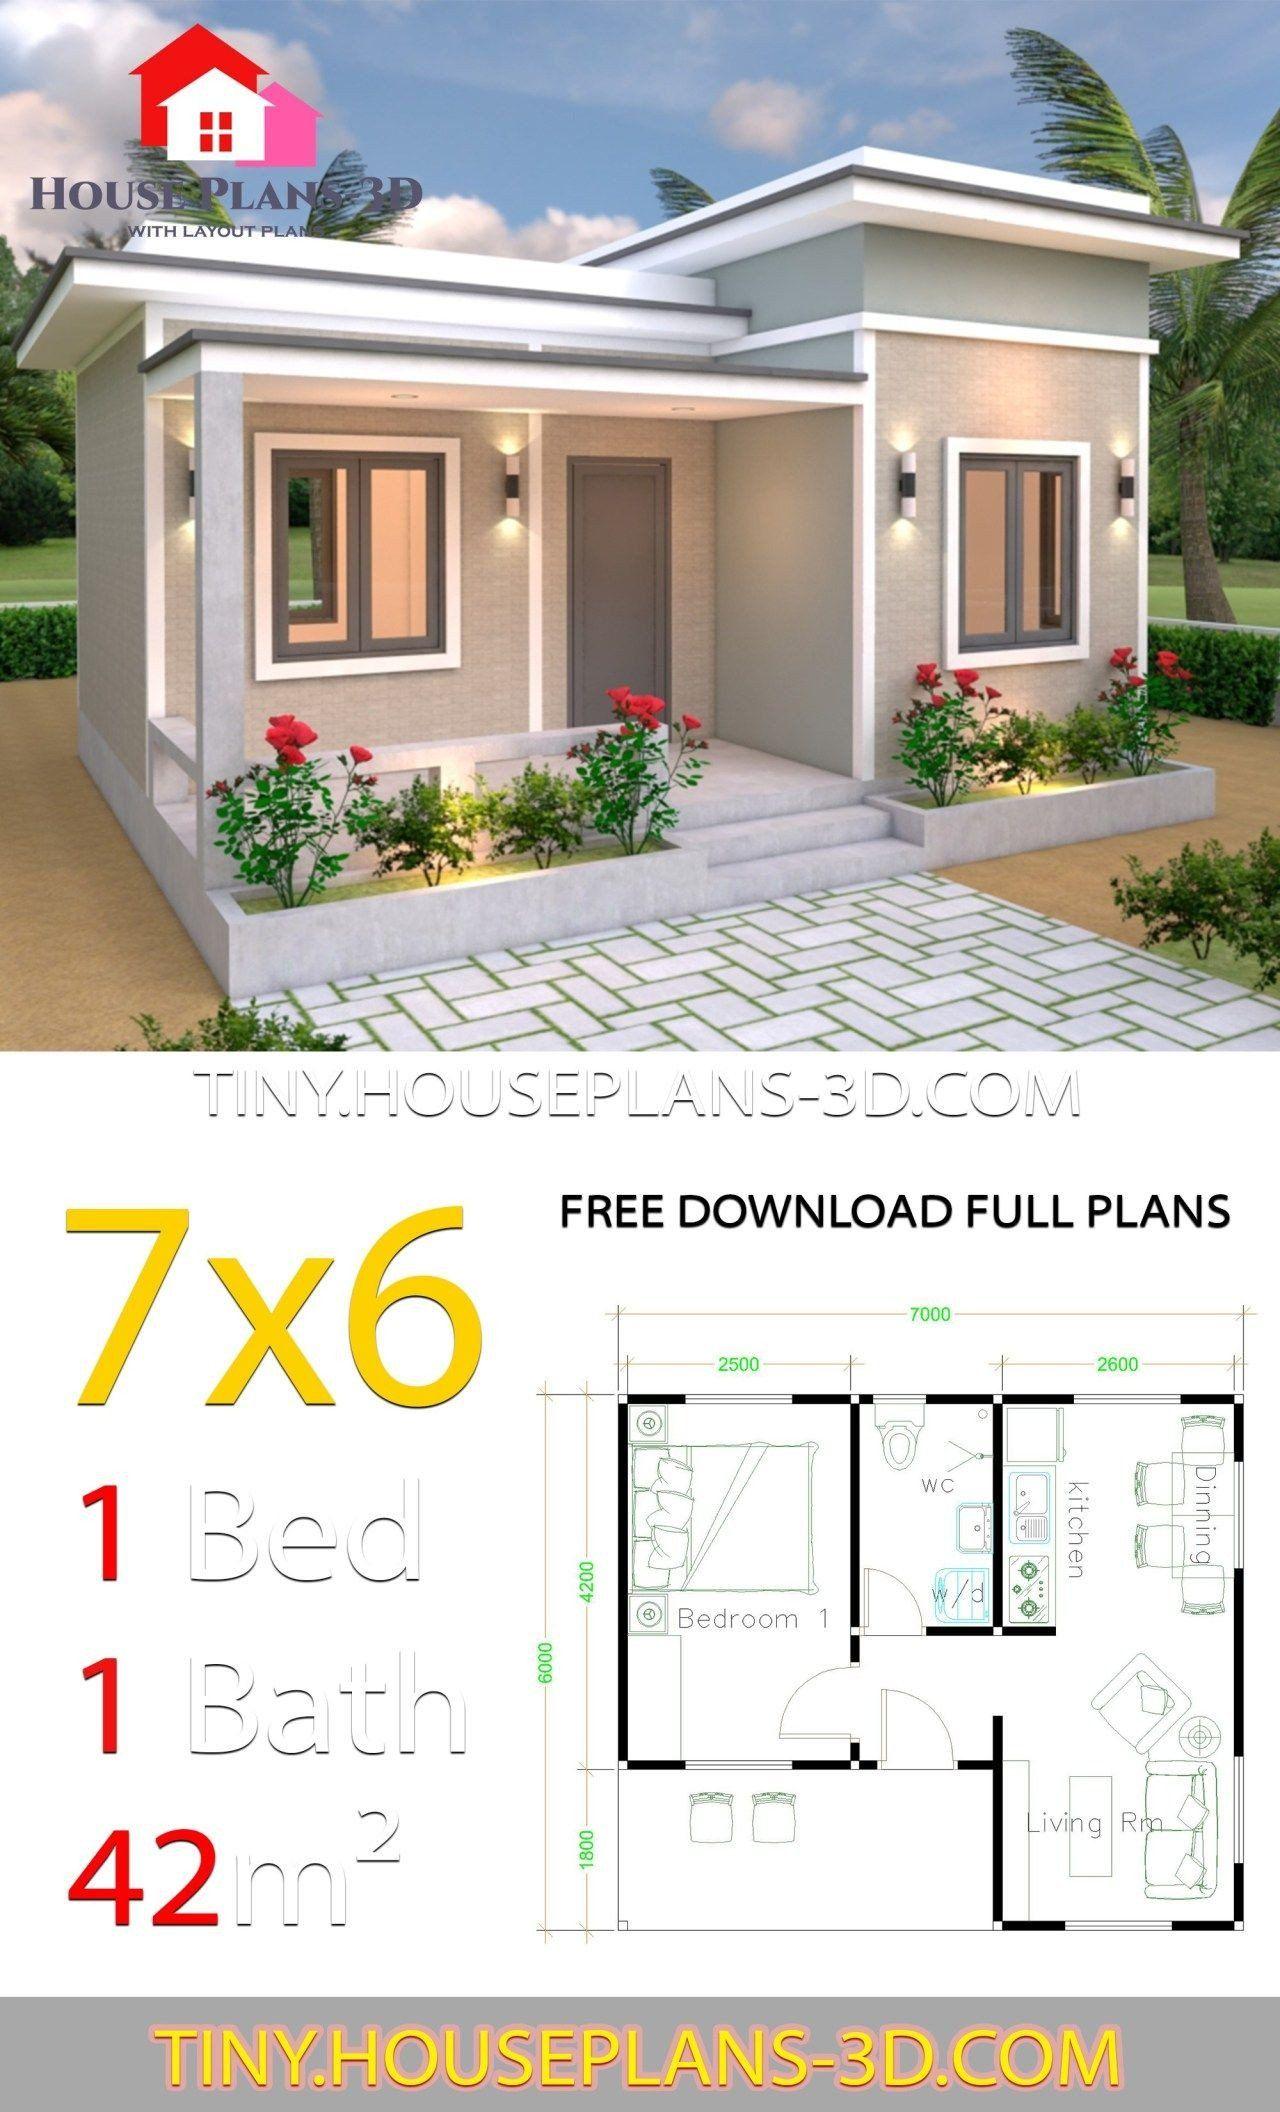 Flat Roof Modern House Floor Plans Tiny House Plans 7x6 With E Bedroom Flat Roof Tiny House Haus Design Winzige Hauser Kleines Hauschen